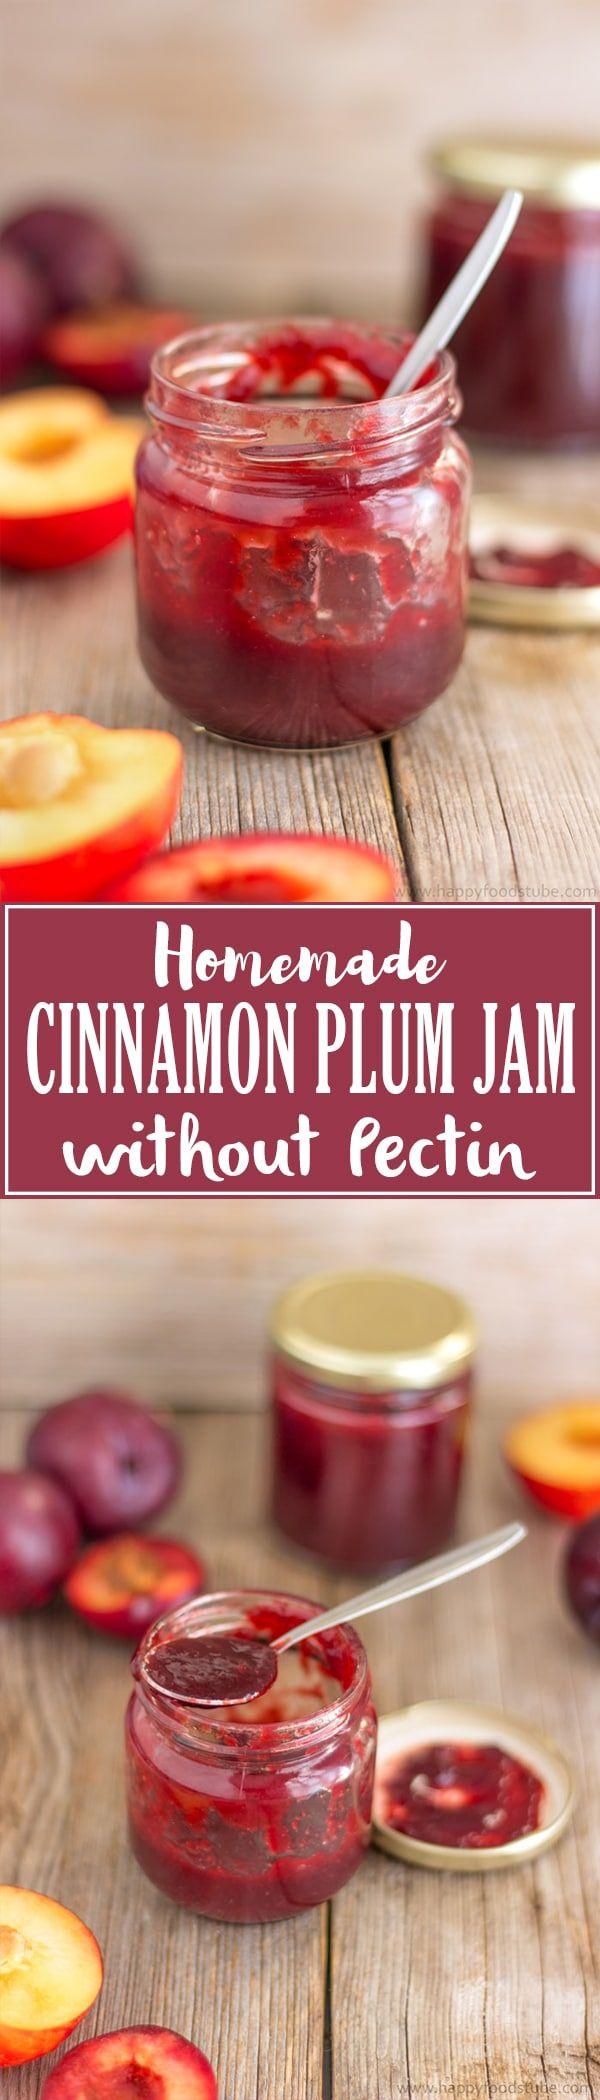 Homemade Low Sugar Cinnamon Plum Jam